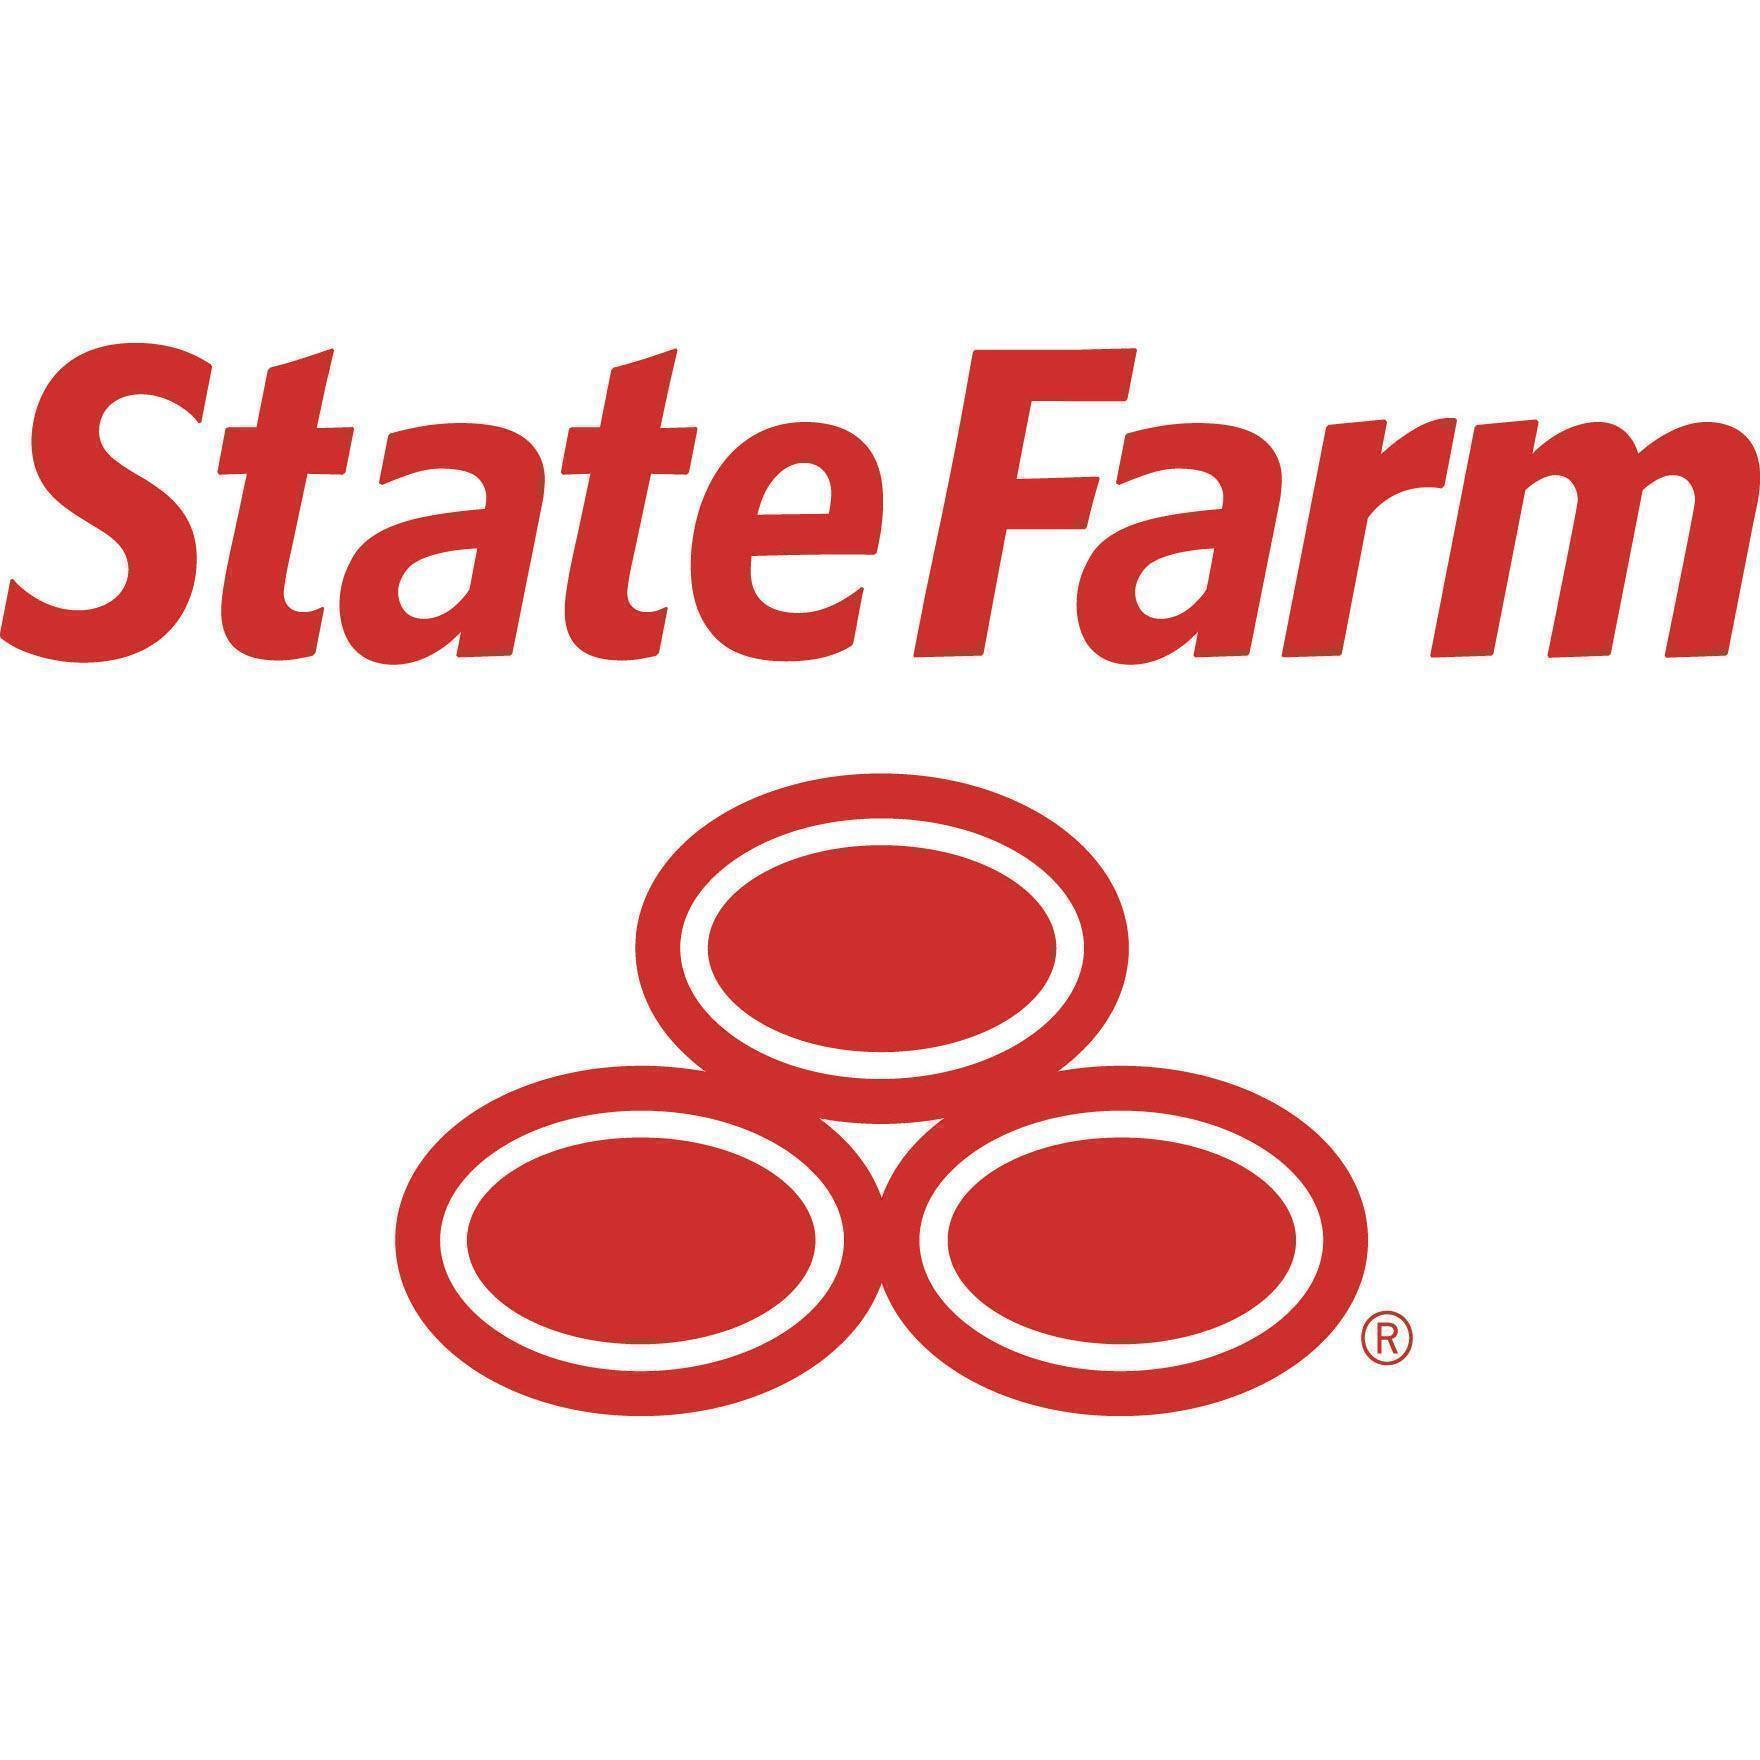 Shane Swan - State Farm Insurance Agent